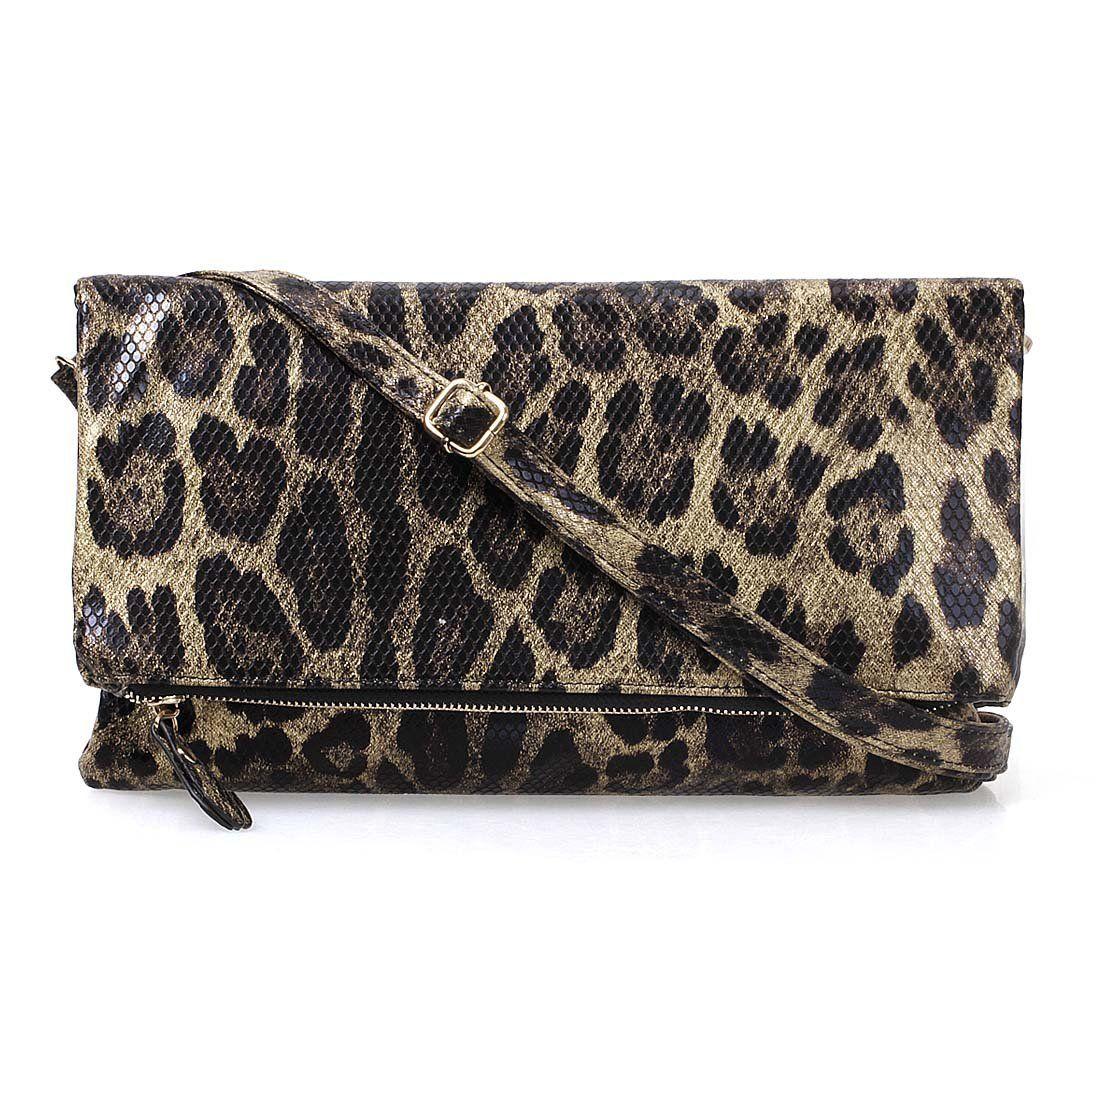 BMC Womens Lustrous Gold Leopard Animal Print Faux Snake Skin Texture Foldover Wristlet Shoulder Strap Clutch Handbag